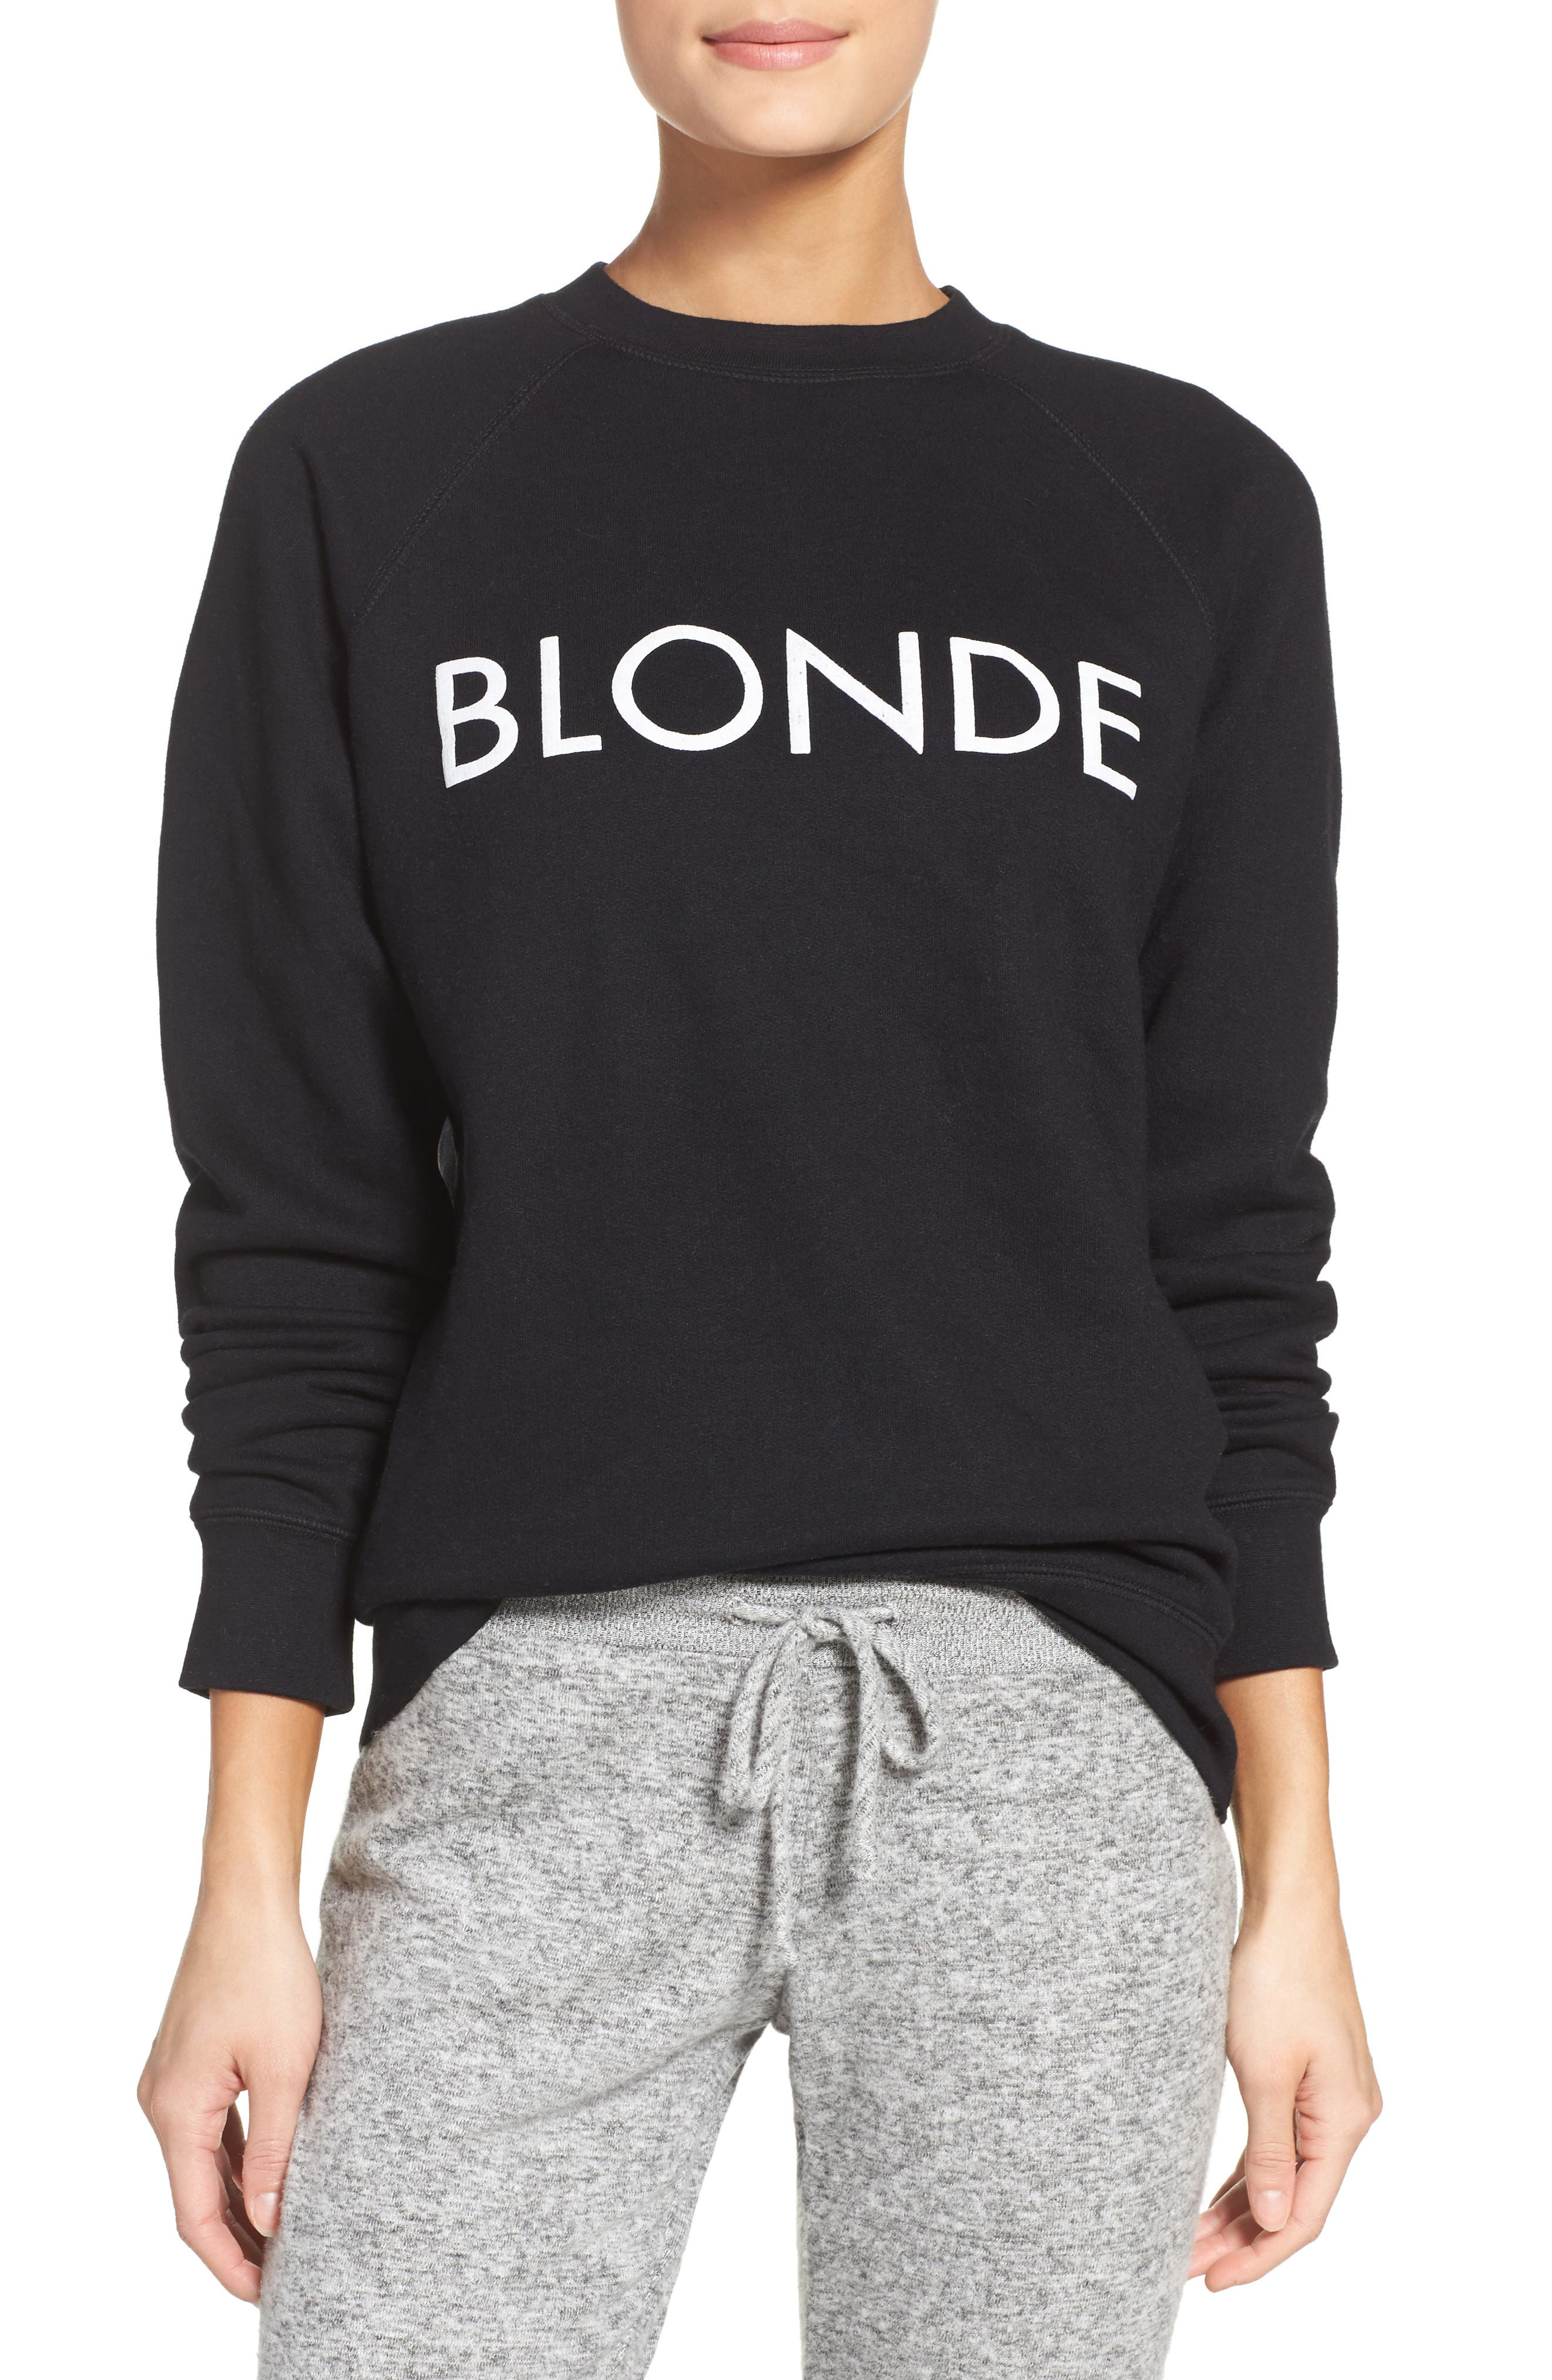 BRUNETTE the Label Blonde Crewneck Sweatshirt